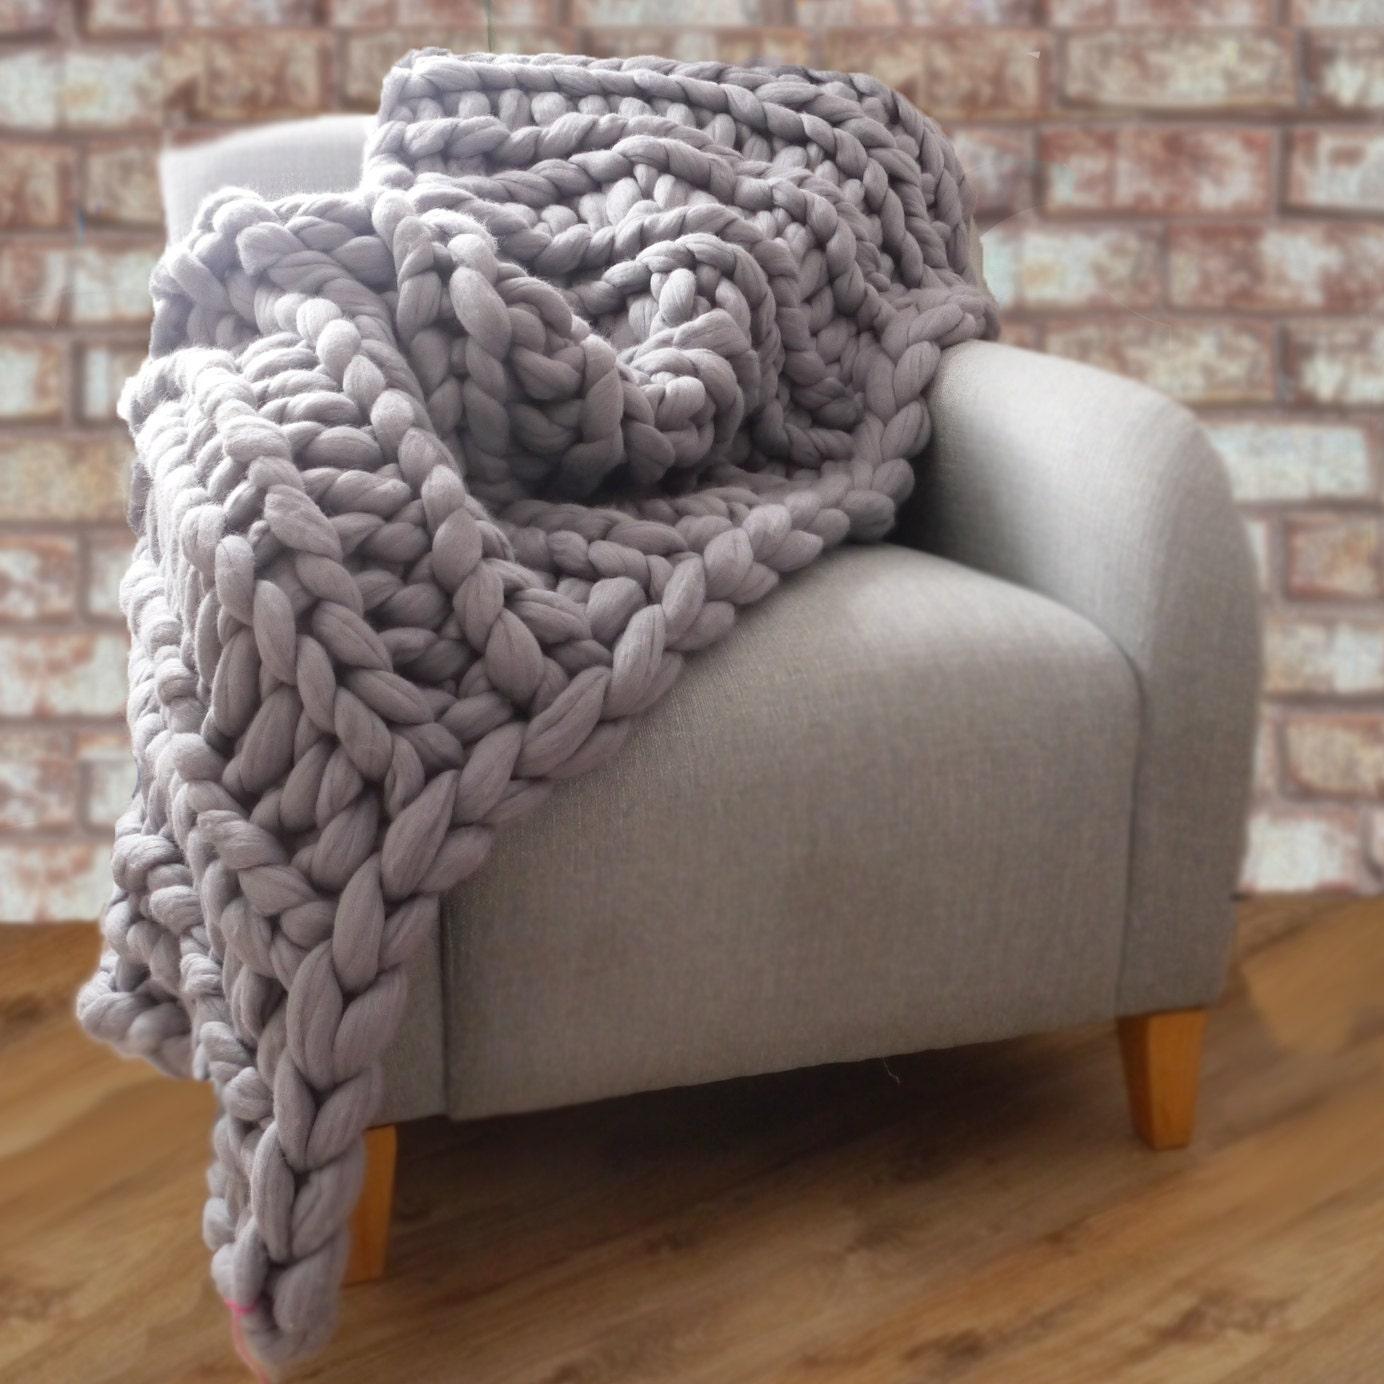 Grey Chunky Knit Blanket Giant Knit Blanket By